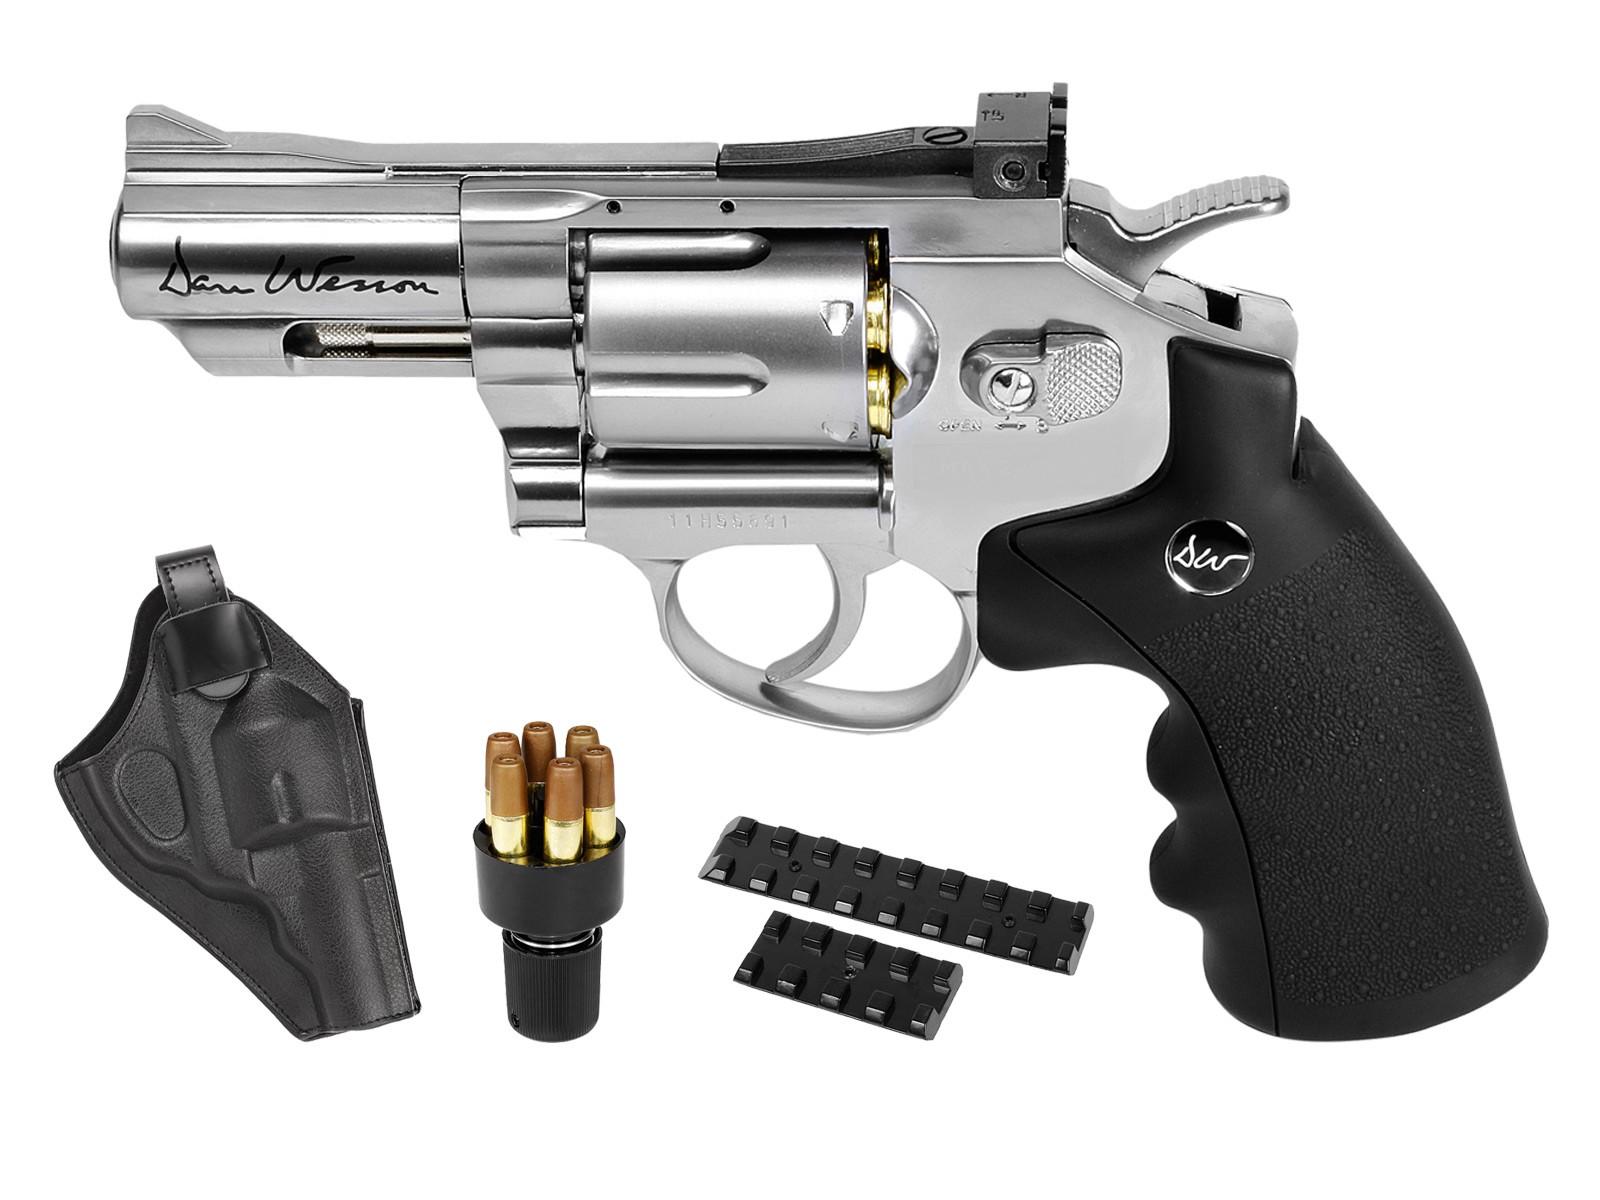 "Dan Wesson 2.5"" Barrel CO2 BB Revolver Kit"